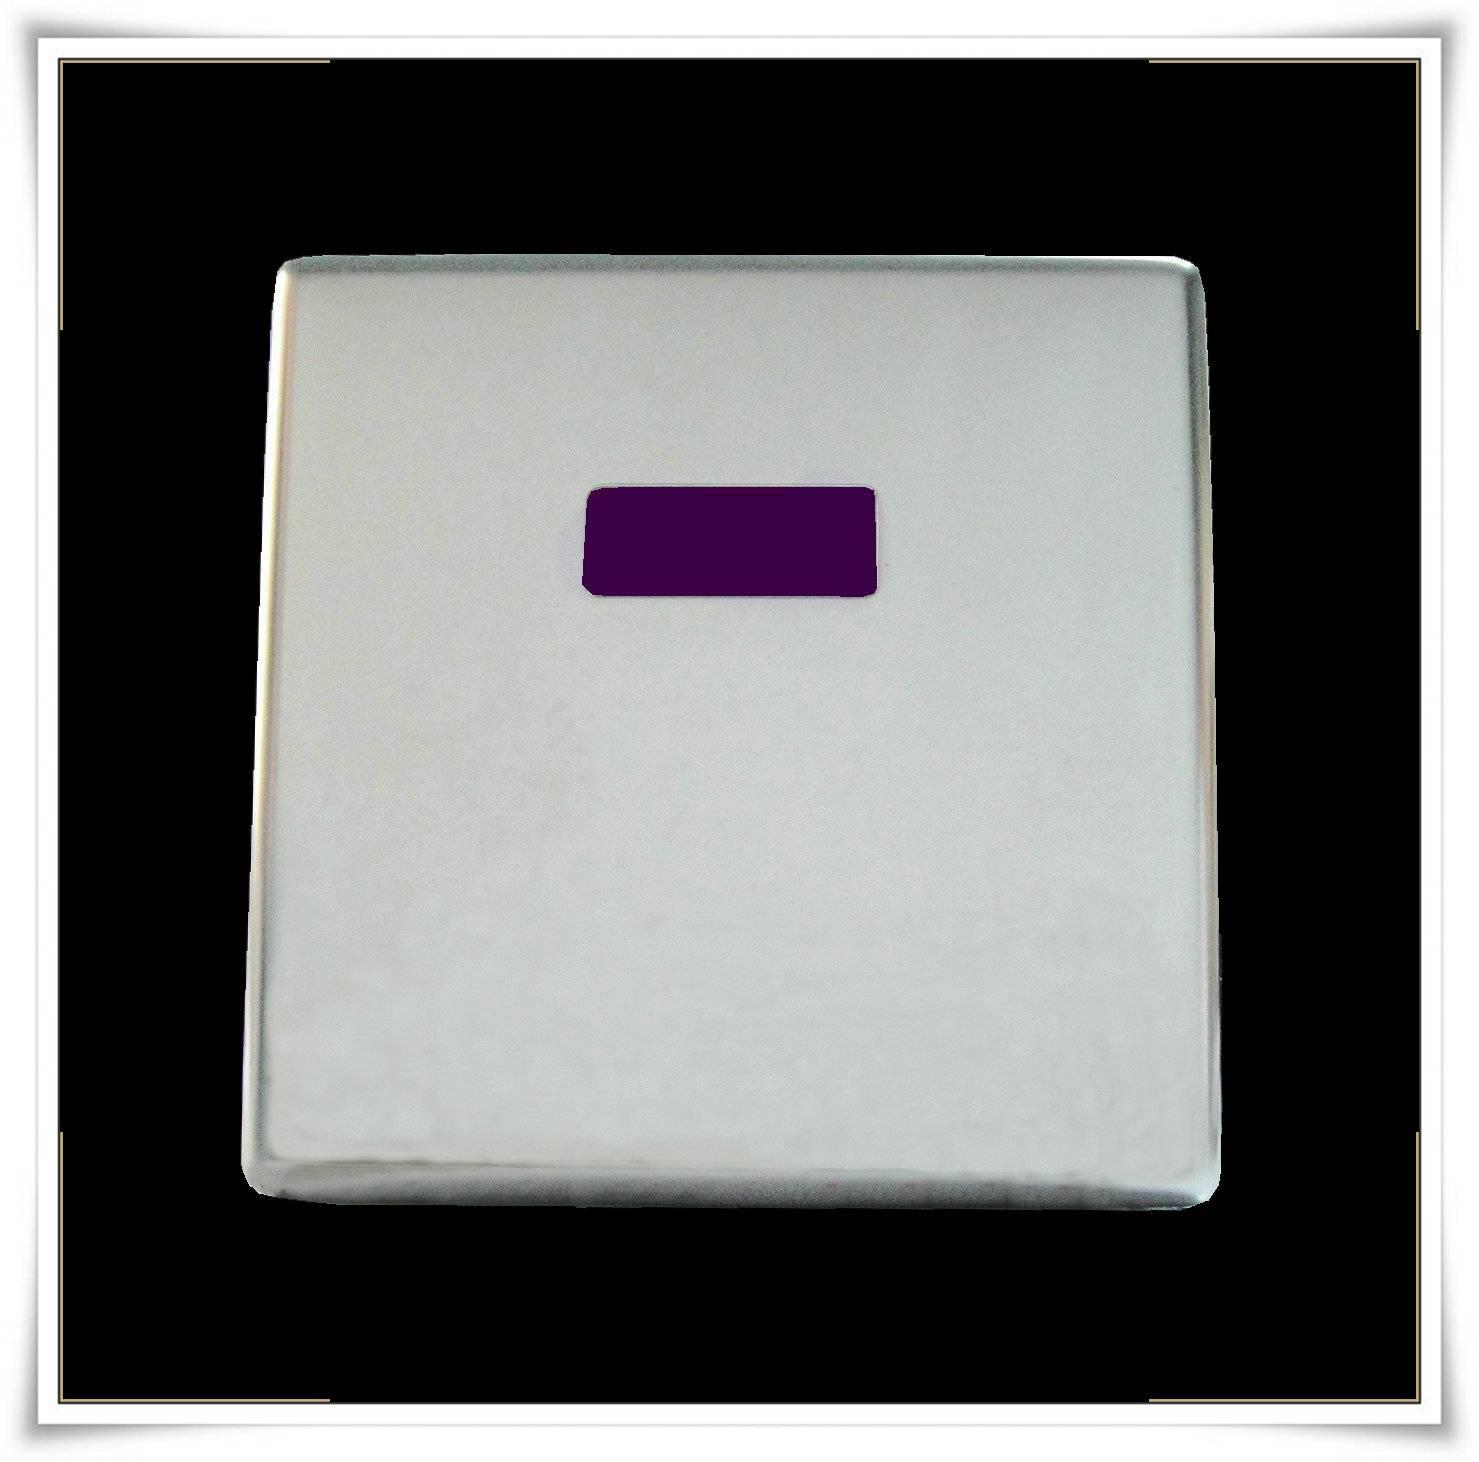 Self-powered auto urinal flush valve(XS-116)